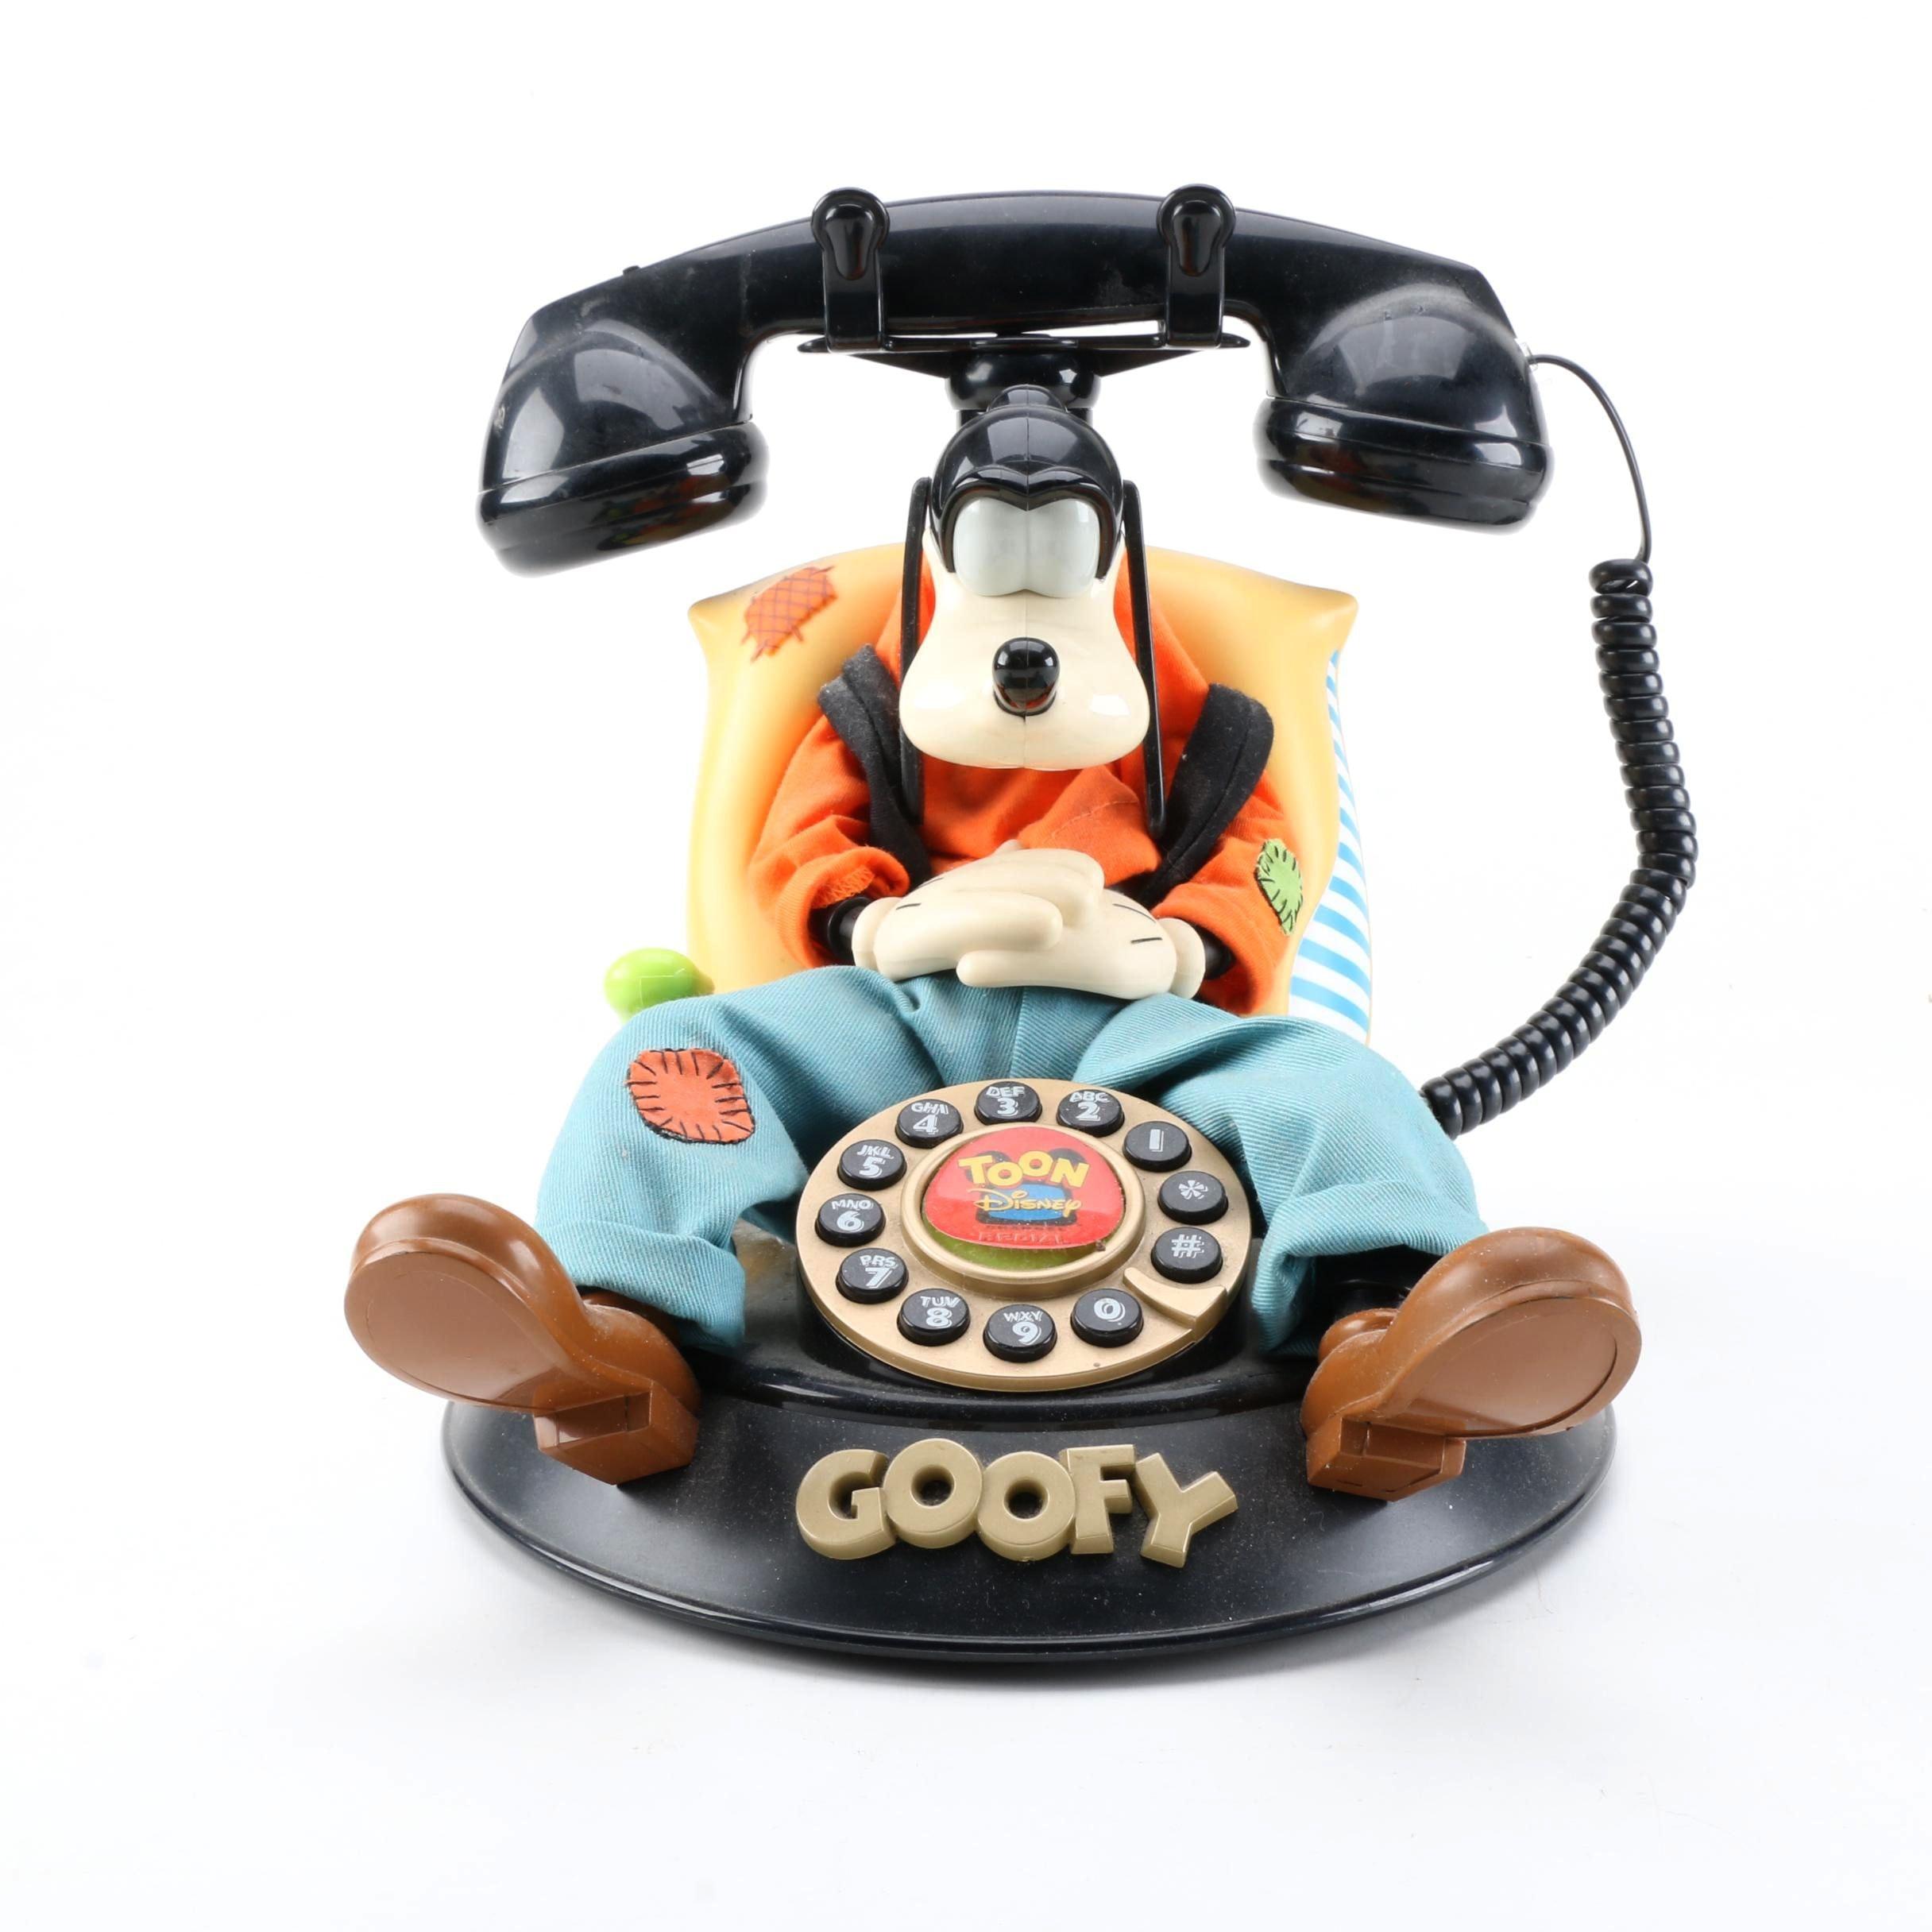 Disney's Goofy Animated Telephone by Telemania